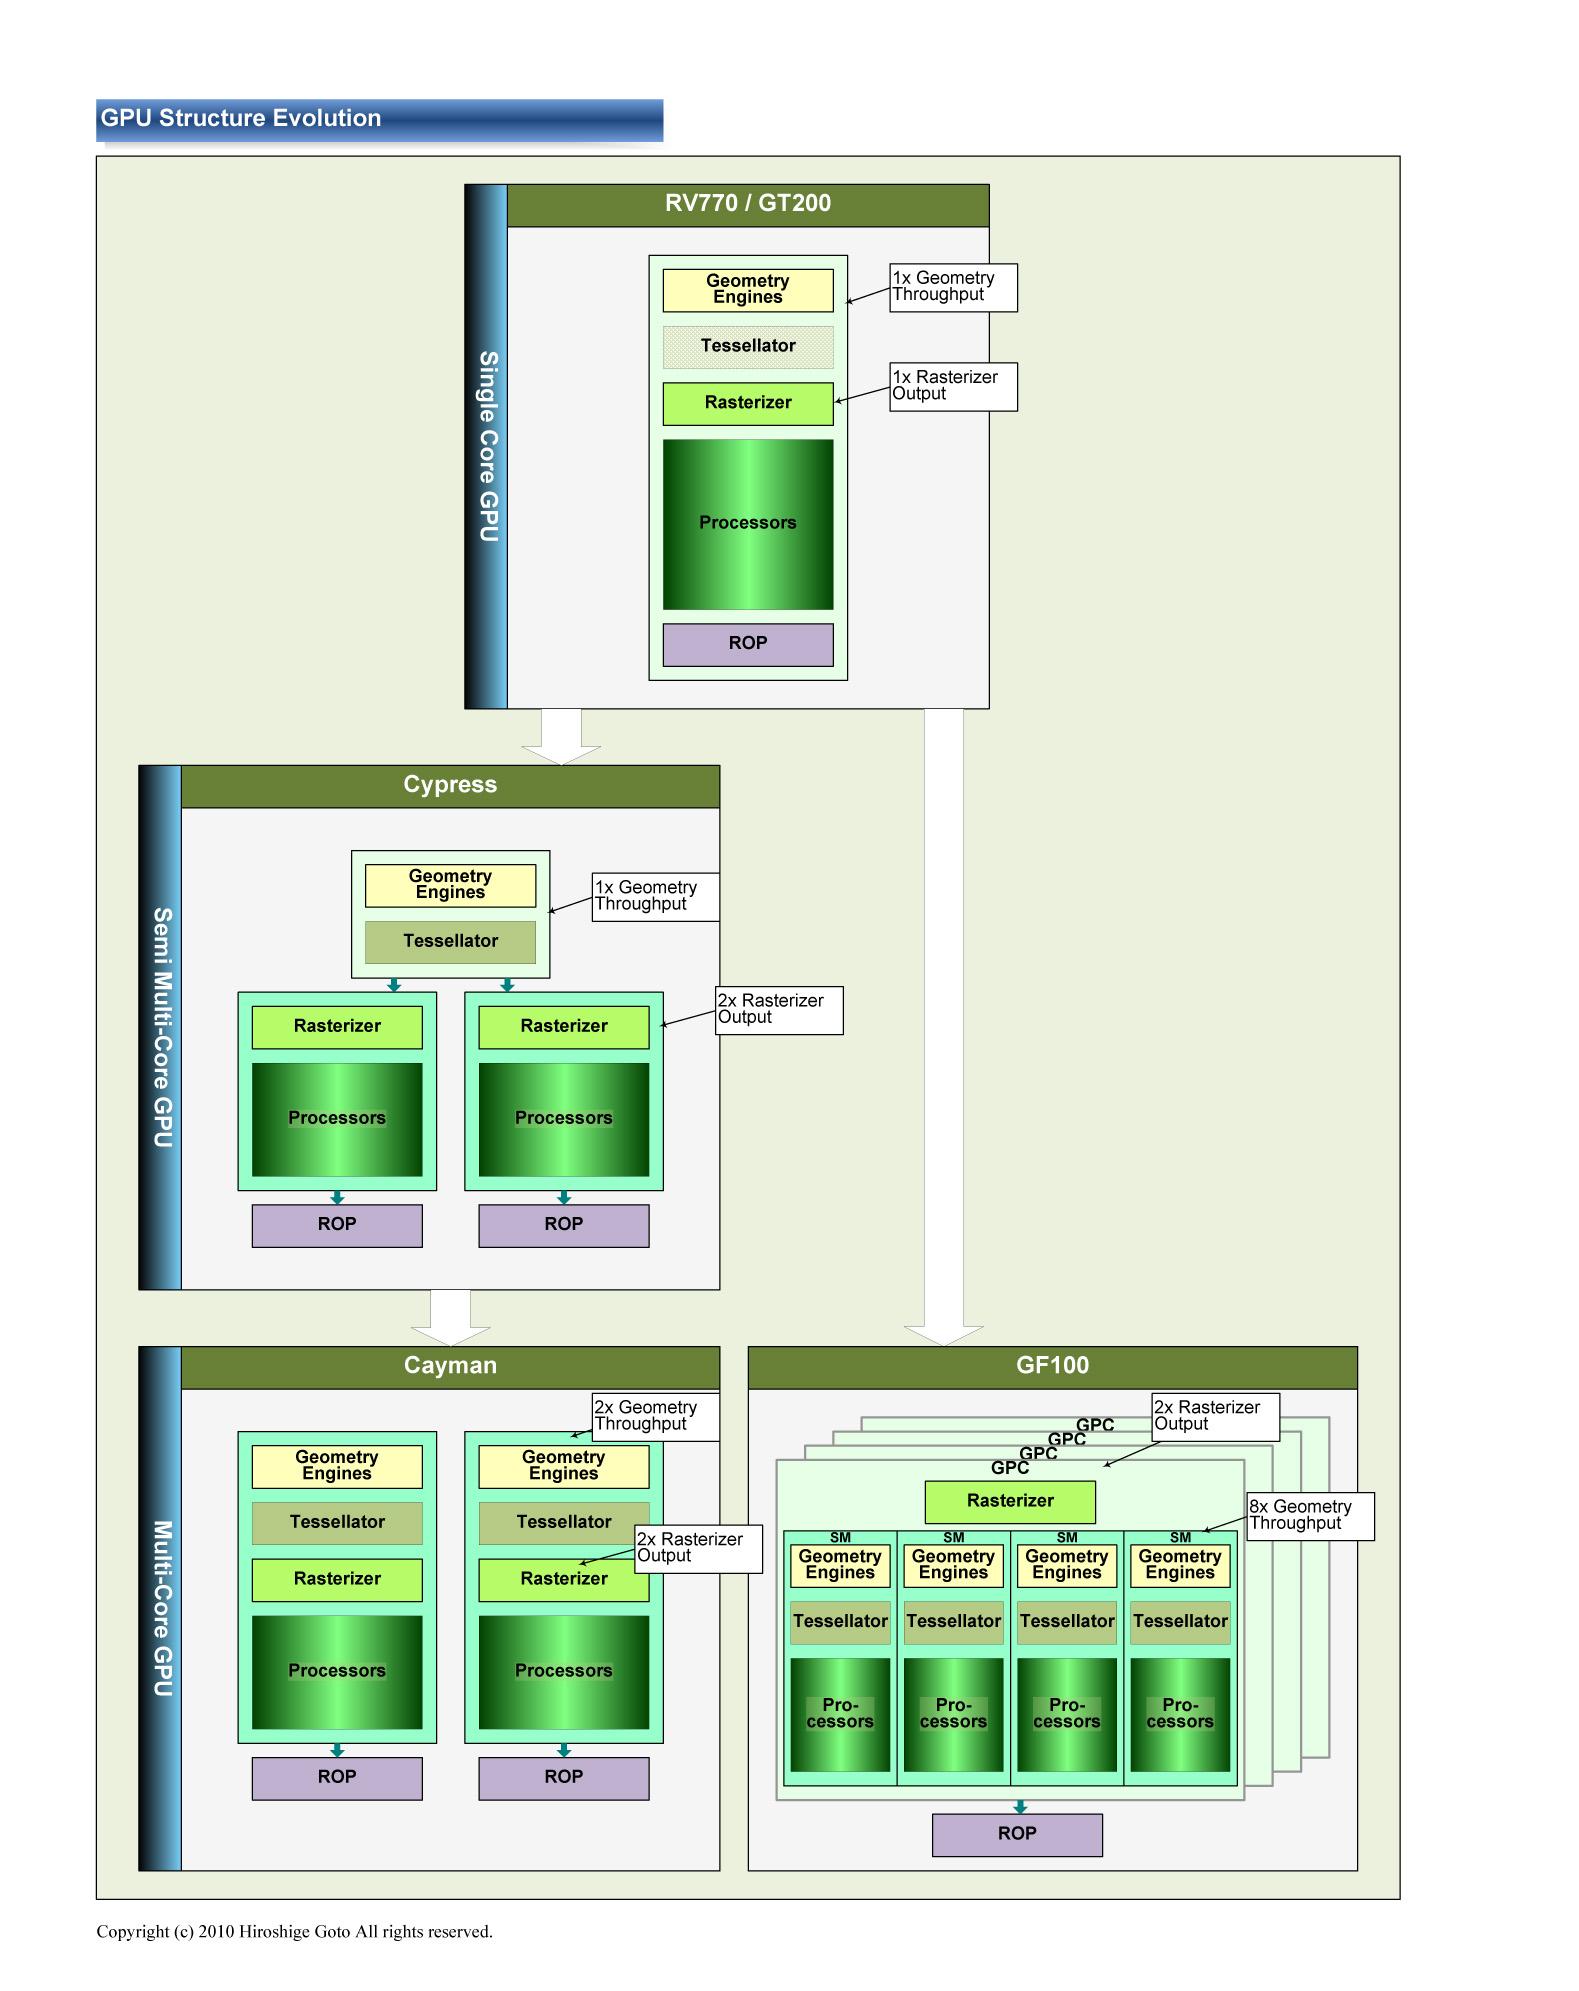 "GPU構造の進化<br class="""">PDF版は<span class=""img-inline raw""><a href=""/video/pcw/docs/591/173/p12.pdf"" ipw_status=""1"" ipw_linktype=""filelink_raw"" class=""resource"">こちら</a></span>"